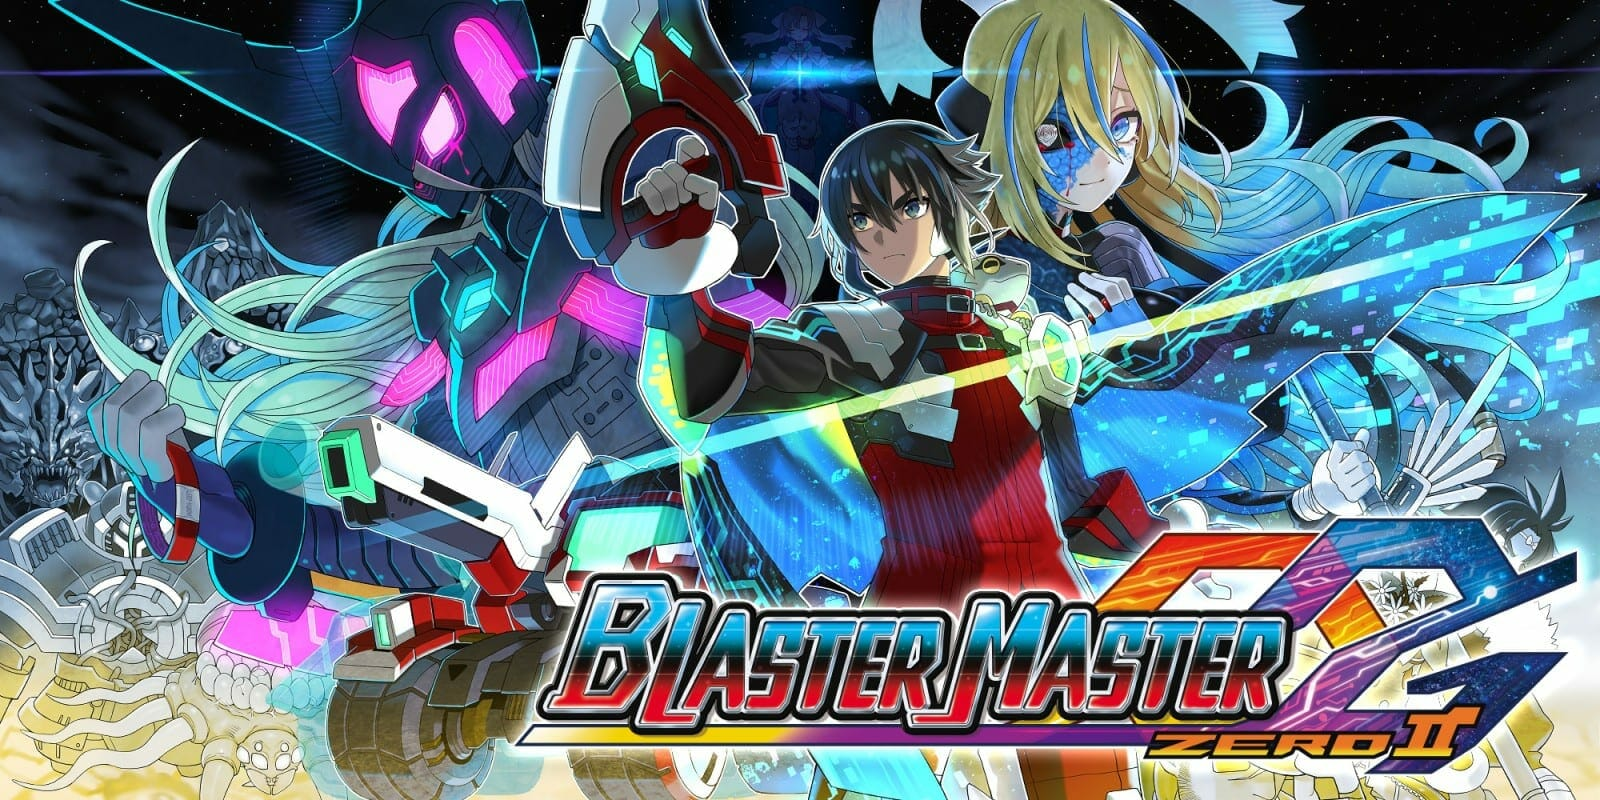 Blaster Master Zero system requirements